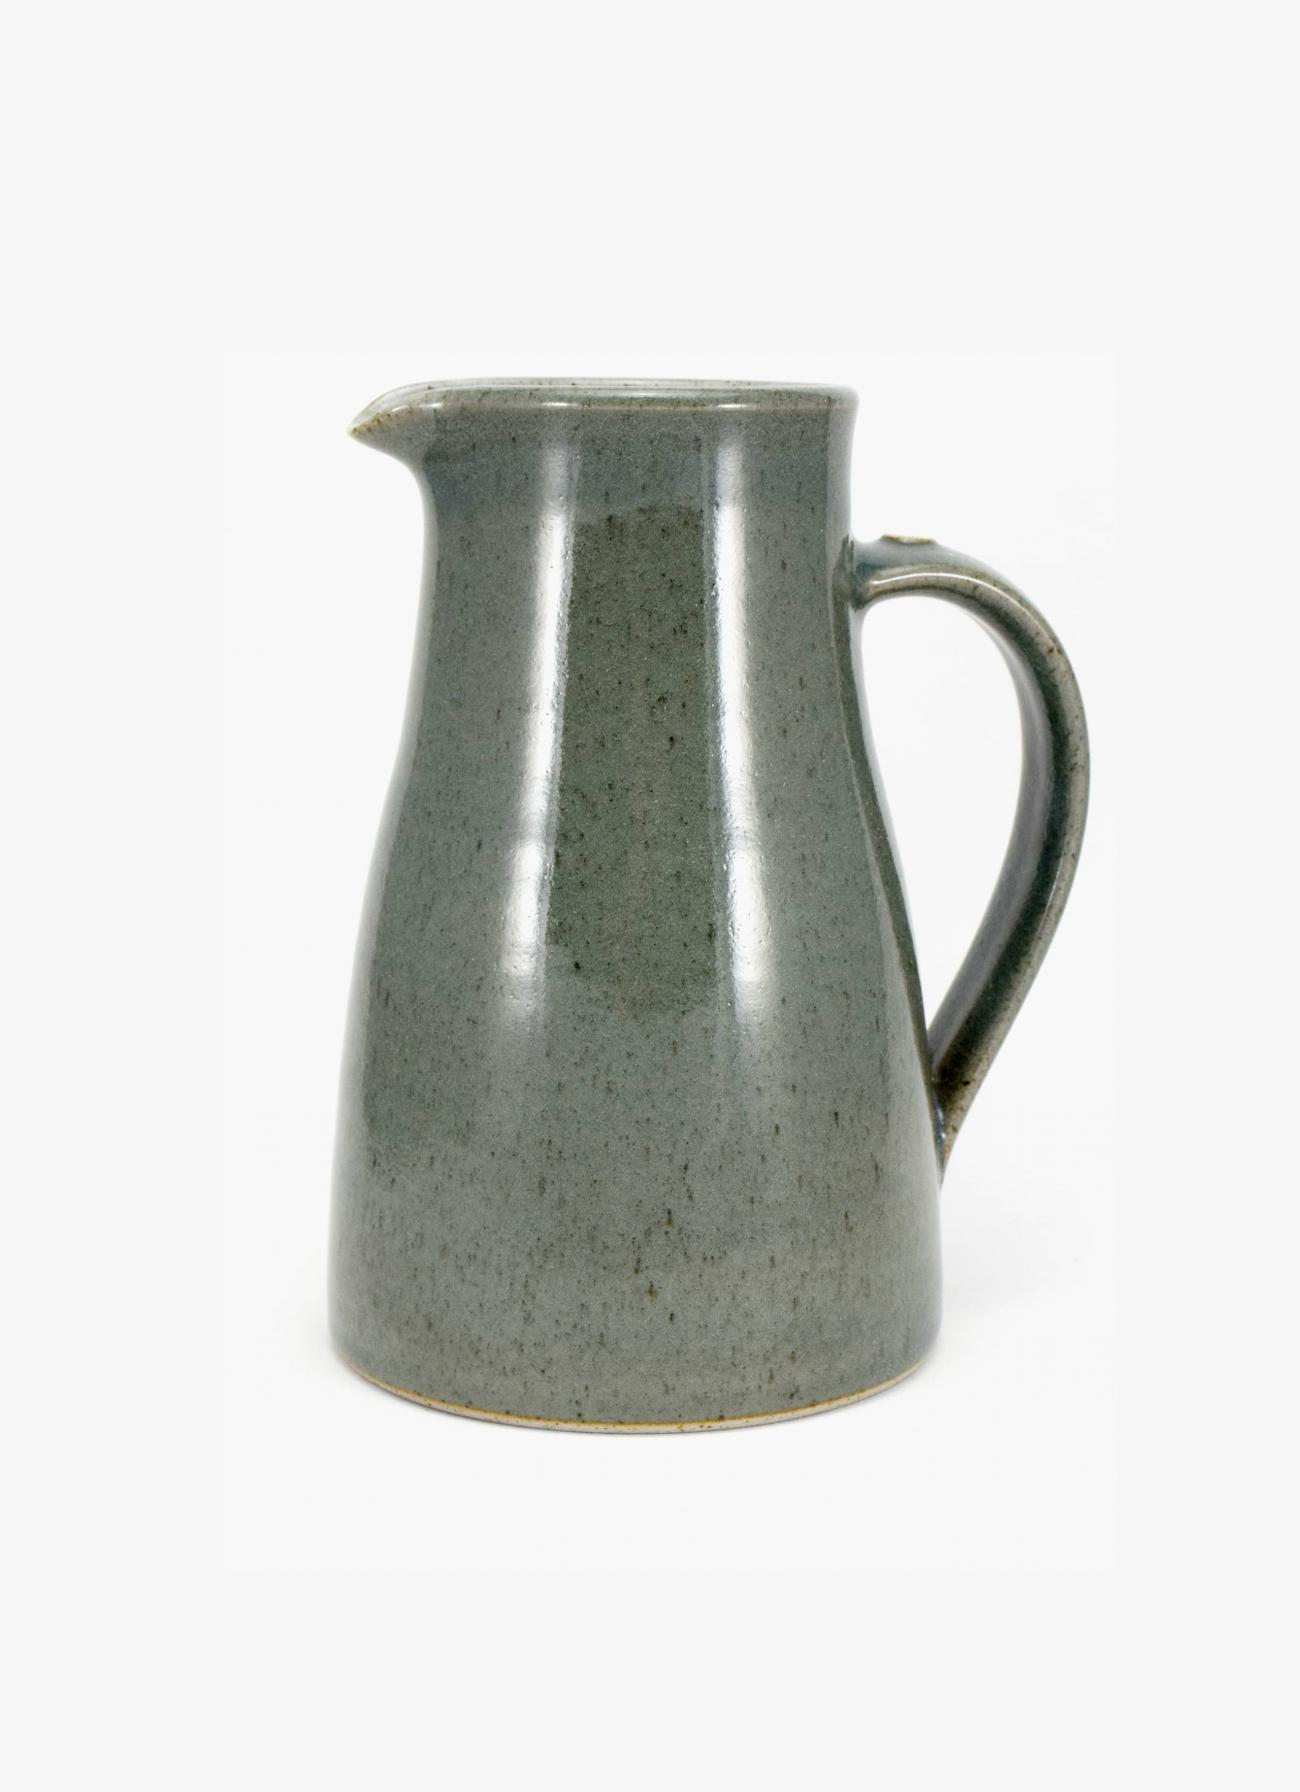 James and Tilla Waters - Thrown Stoneware - Large Jug - Green Celadon Glaze